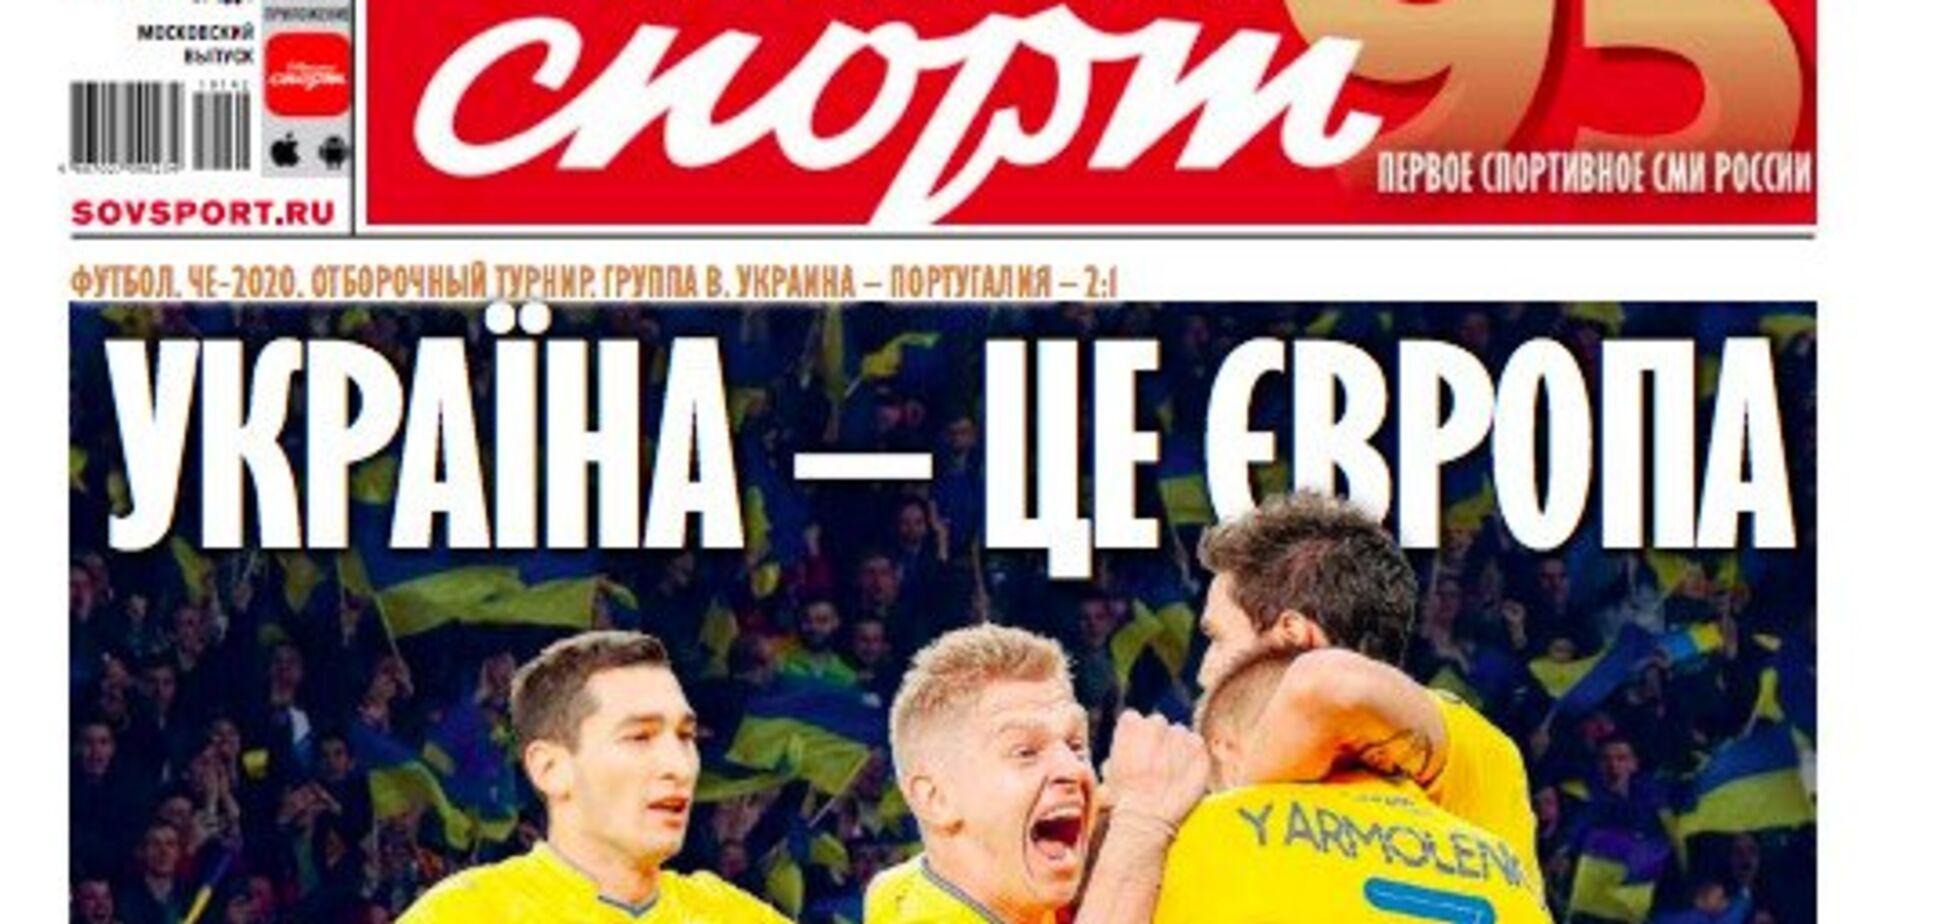 РосСМИ заговорили по-украински из-за Евро-2020